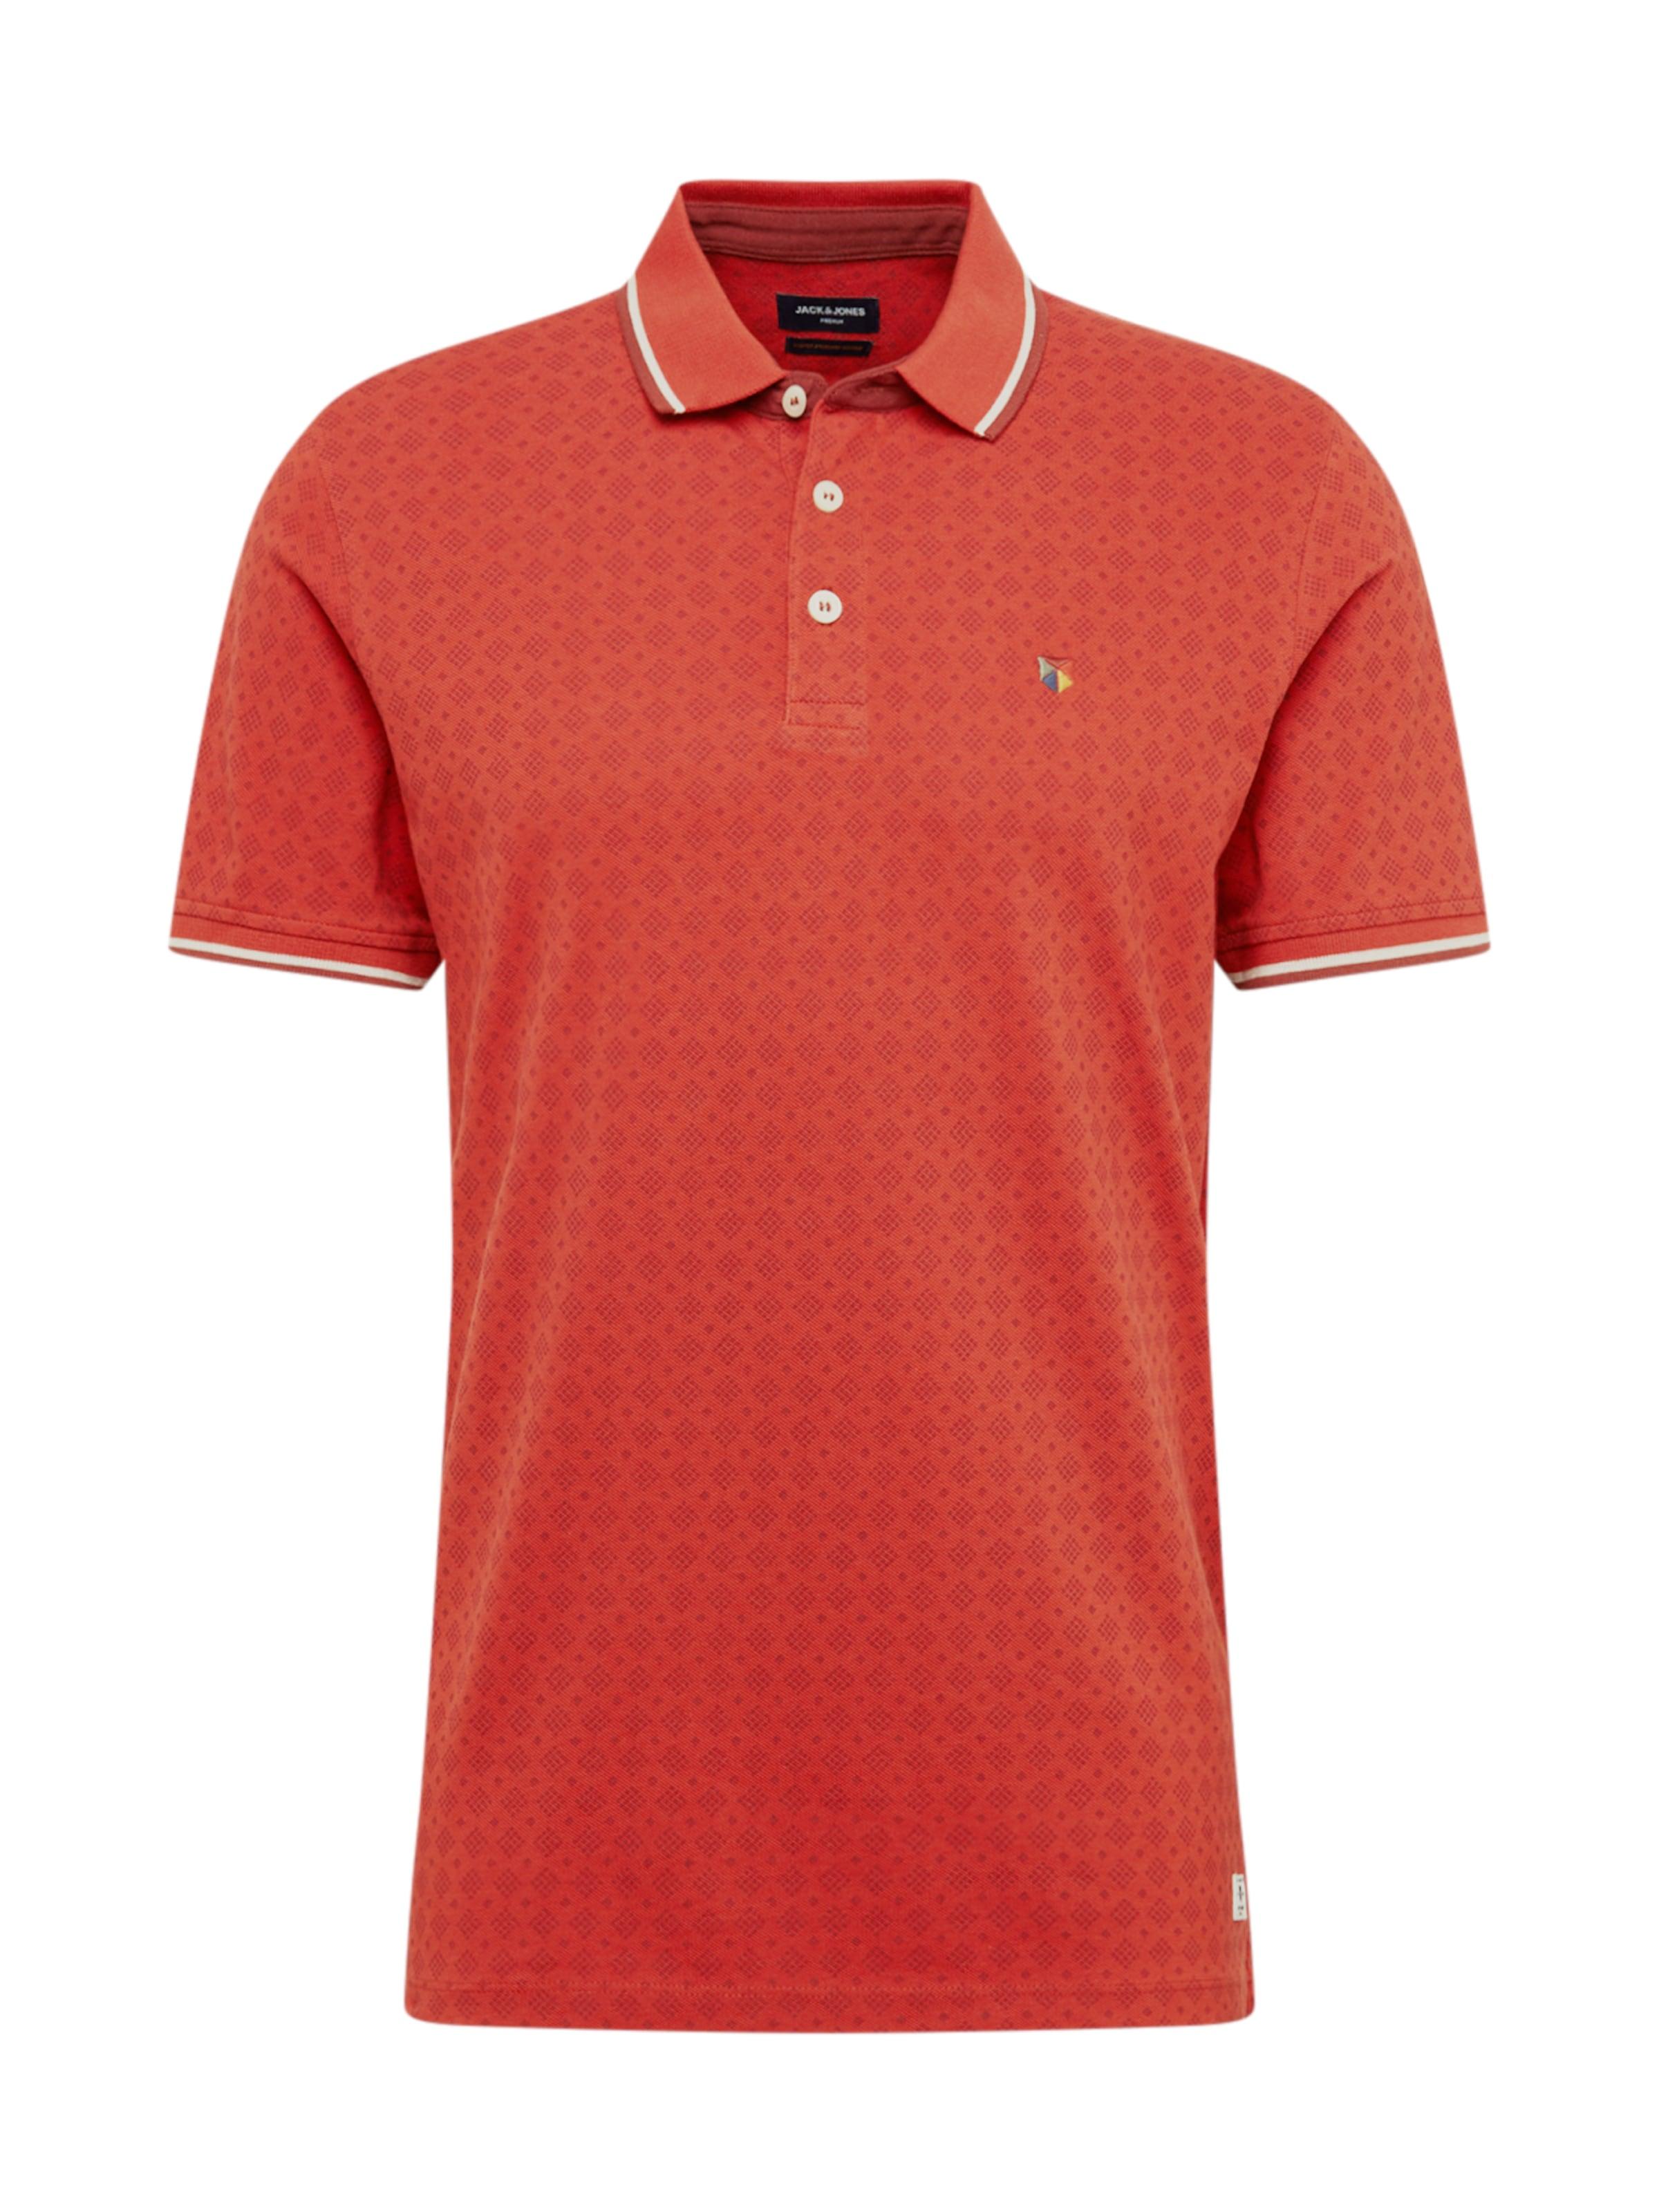 Orangé En Jones T shirt Jackamp; Rouge LqVUpGSzM